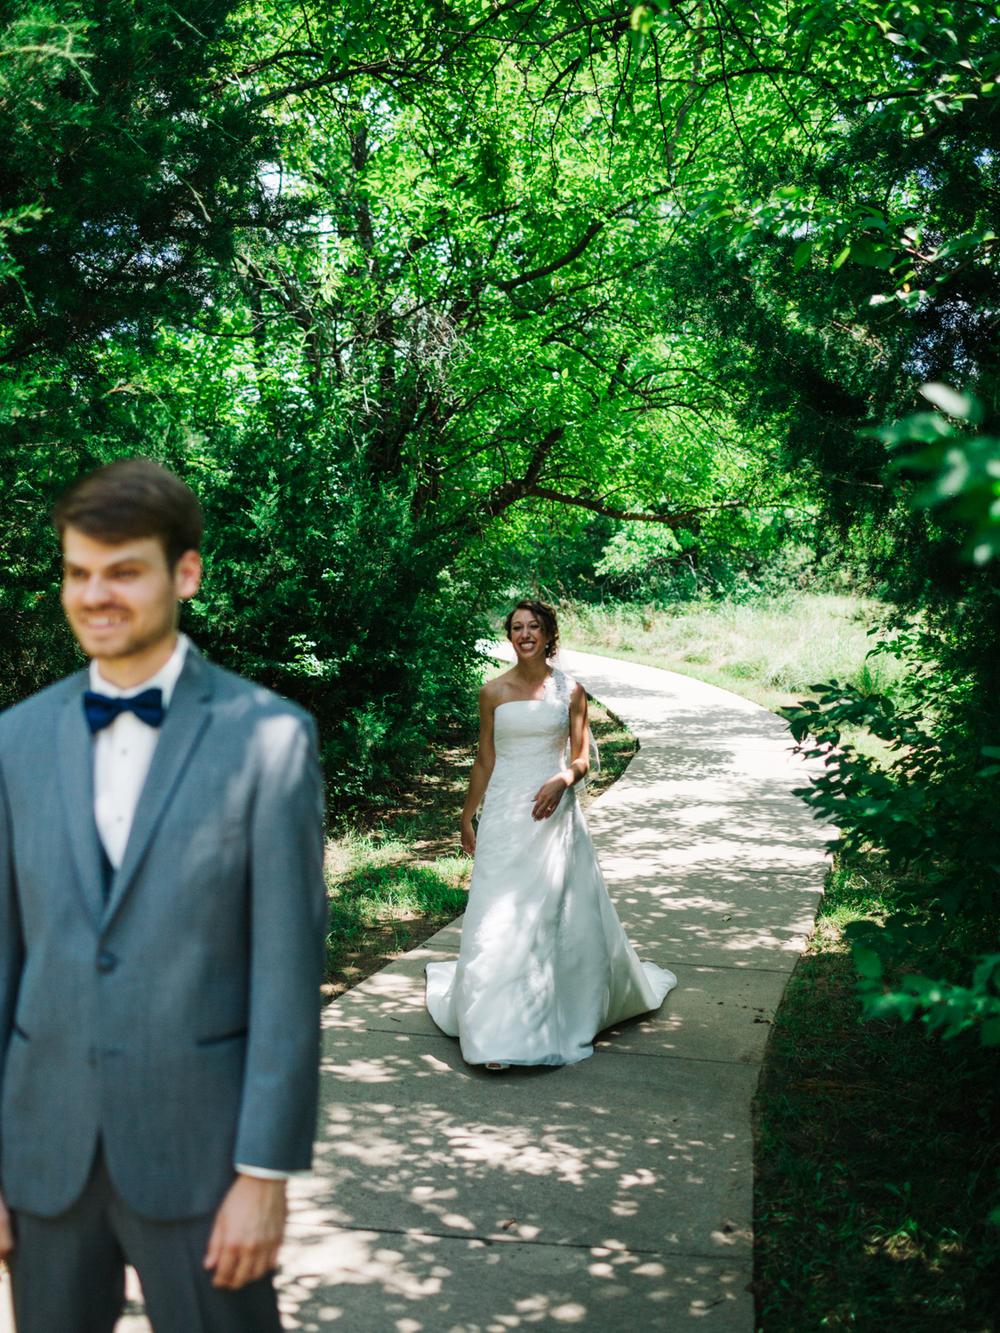 Wichita, Kansas Wedding Photographer - Neal Dieker - Wedding Photography-144.jpg